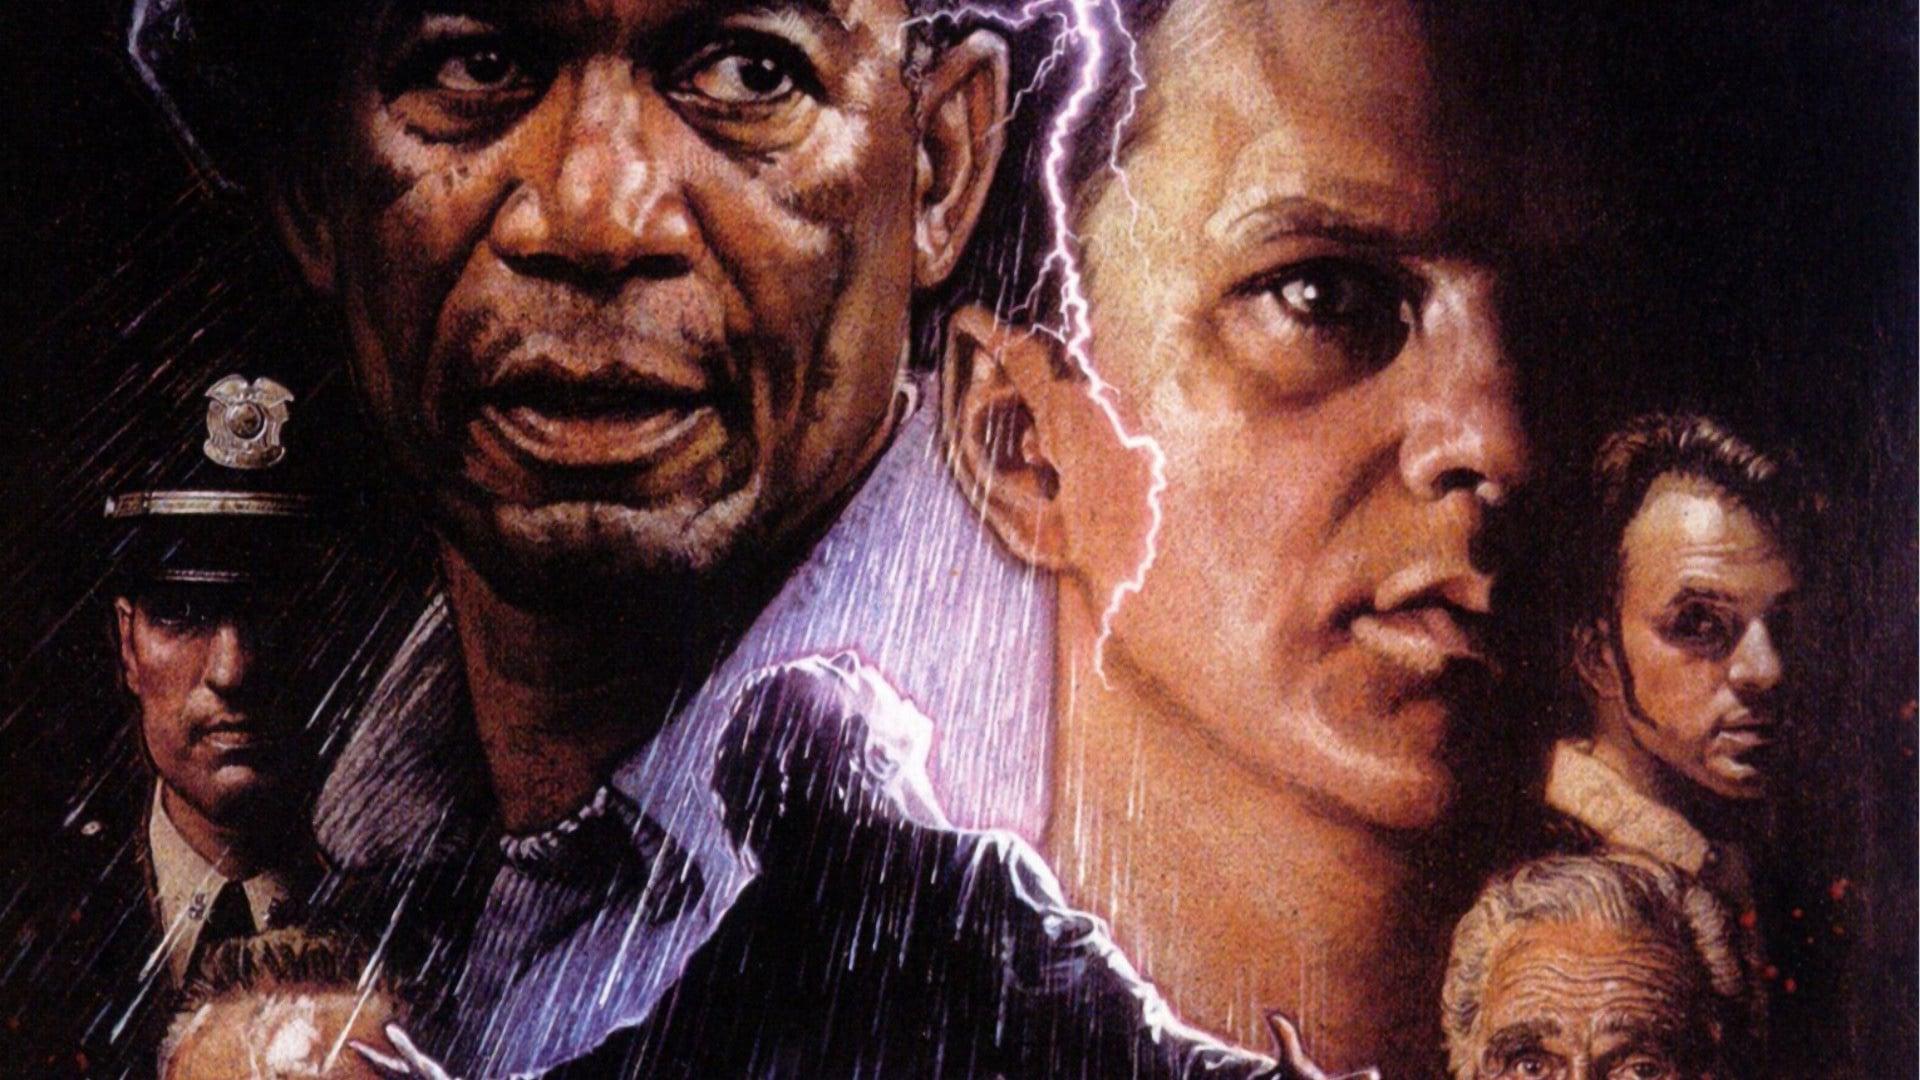 Free Watch The Shawshank Redemption 1994 Summary Movies